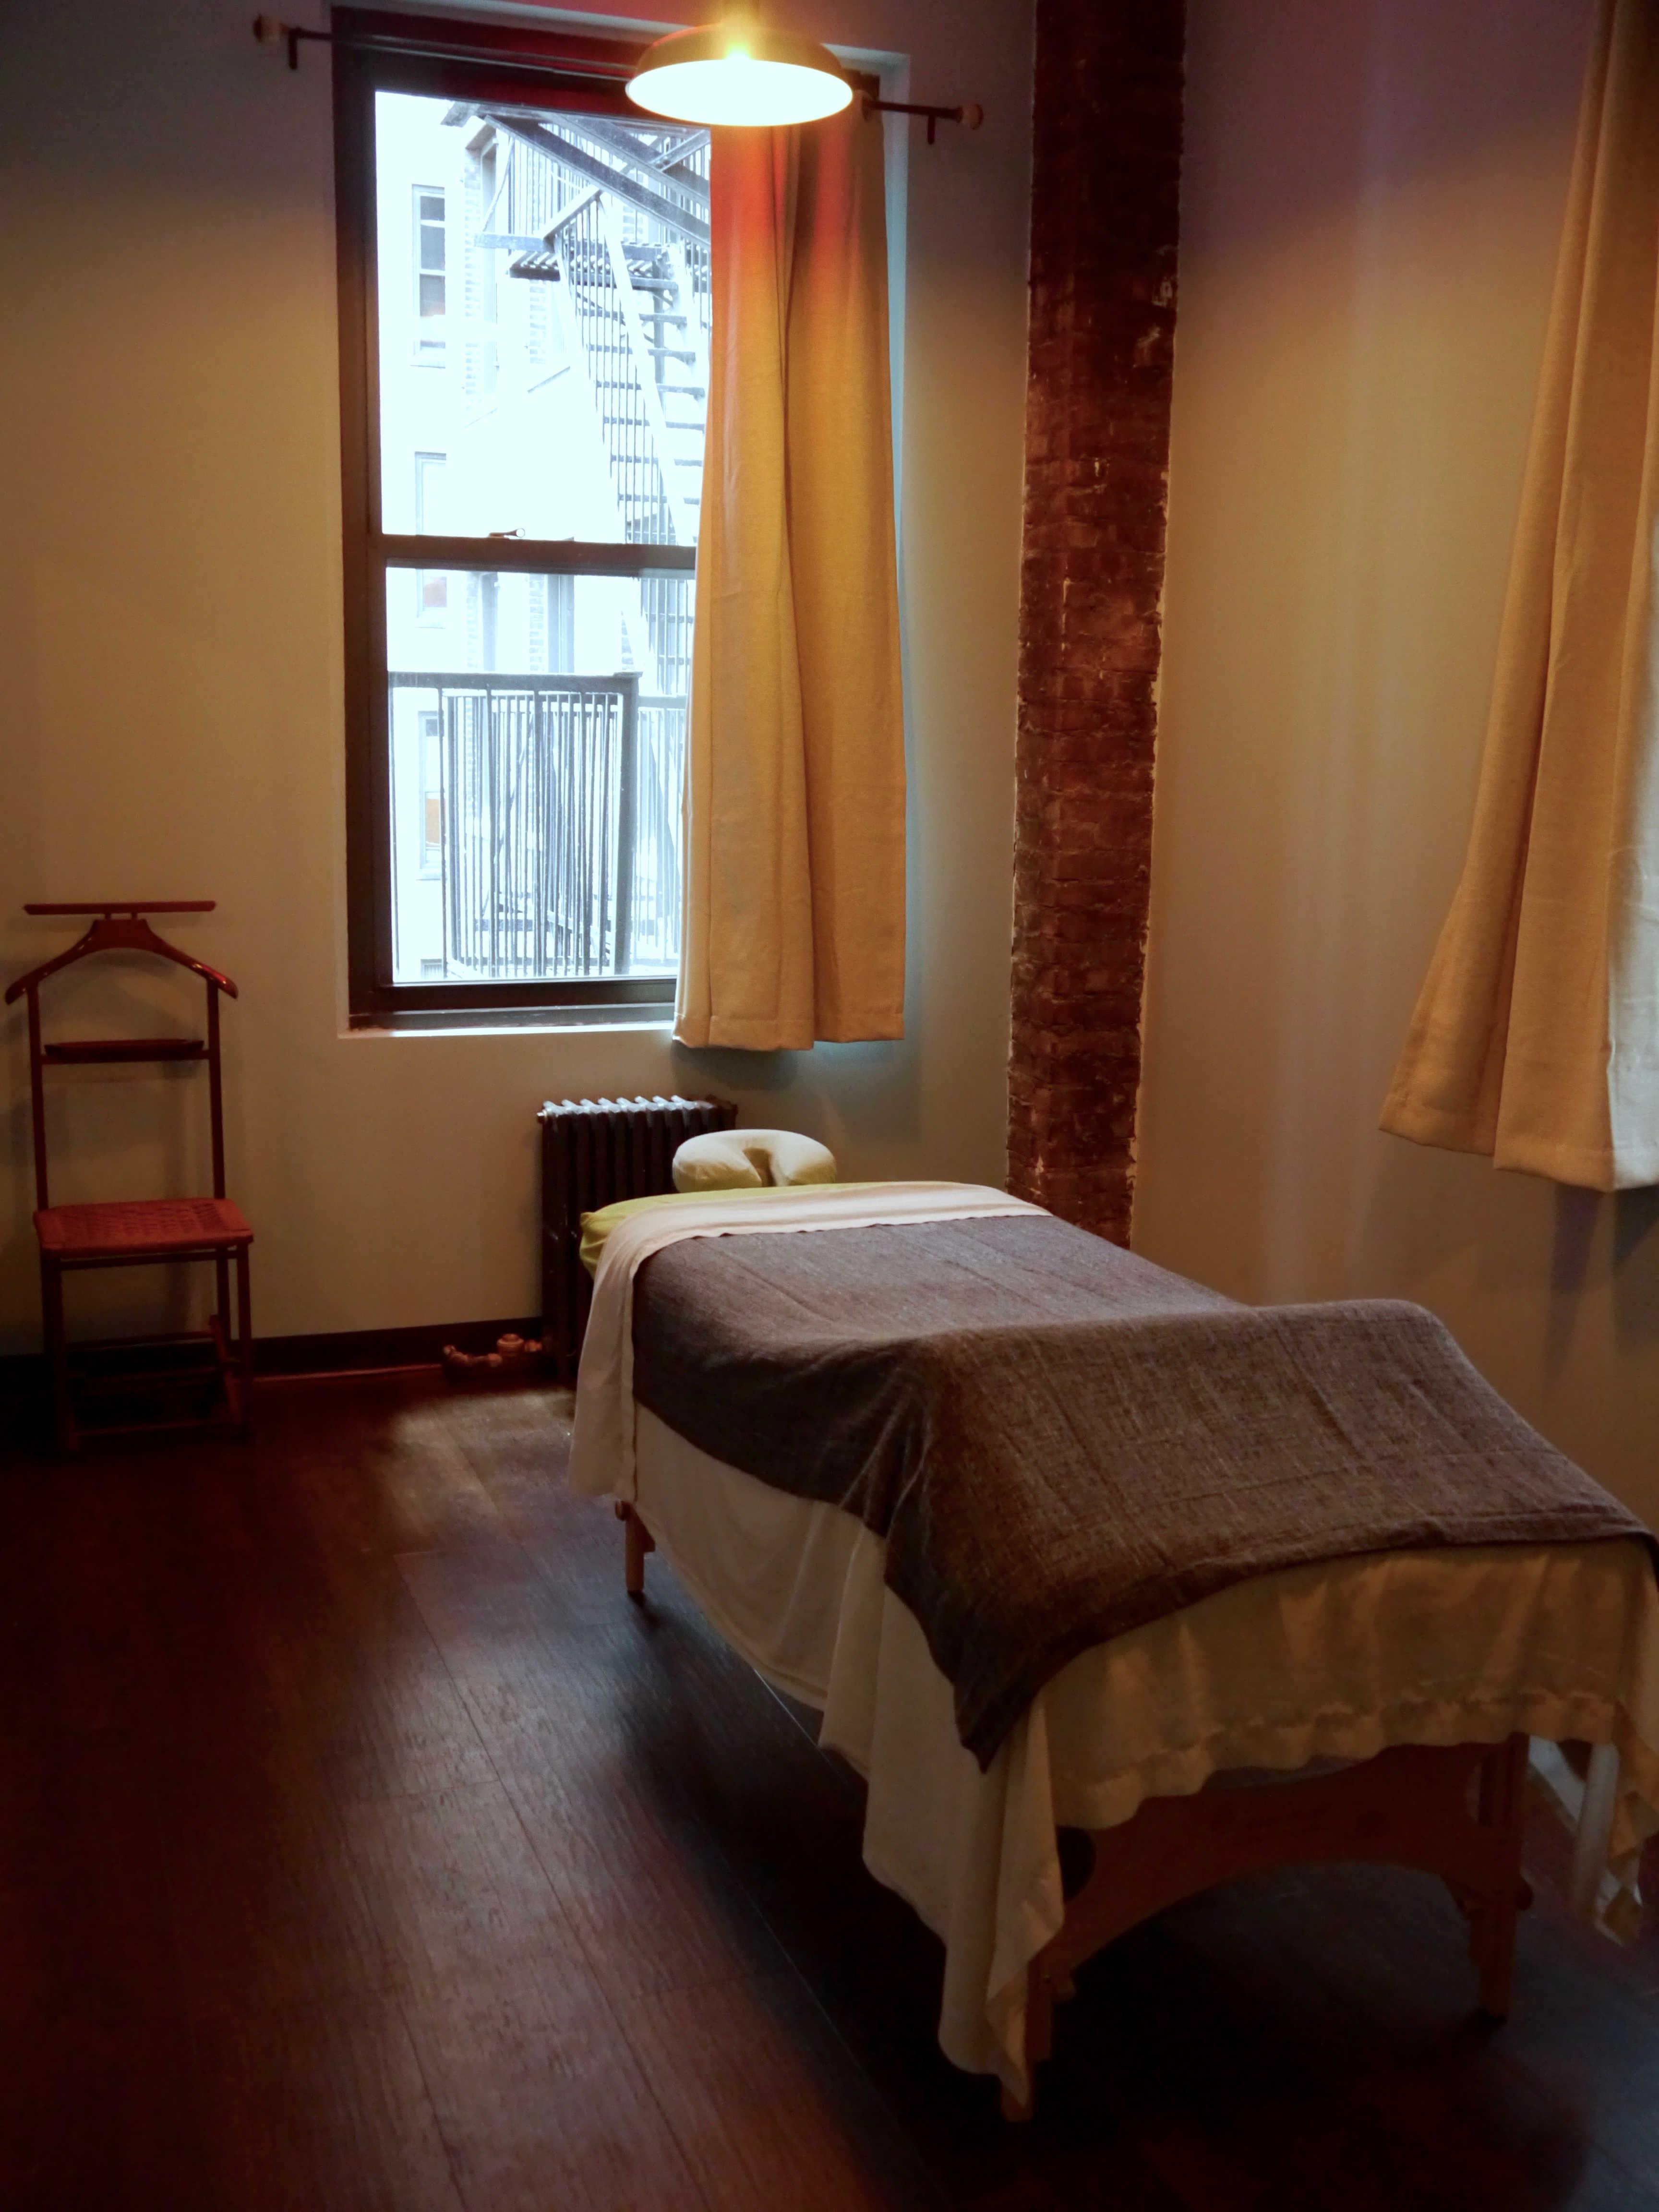 Massage Therapy in Fidi: Bodyworks DW